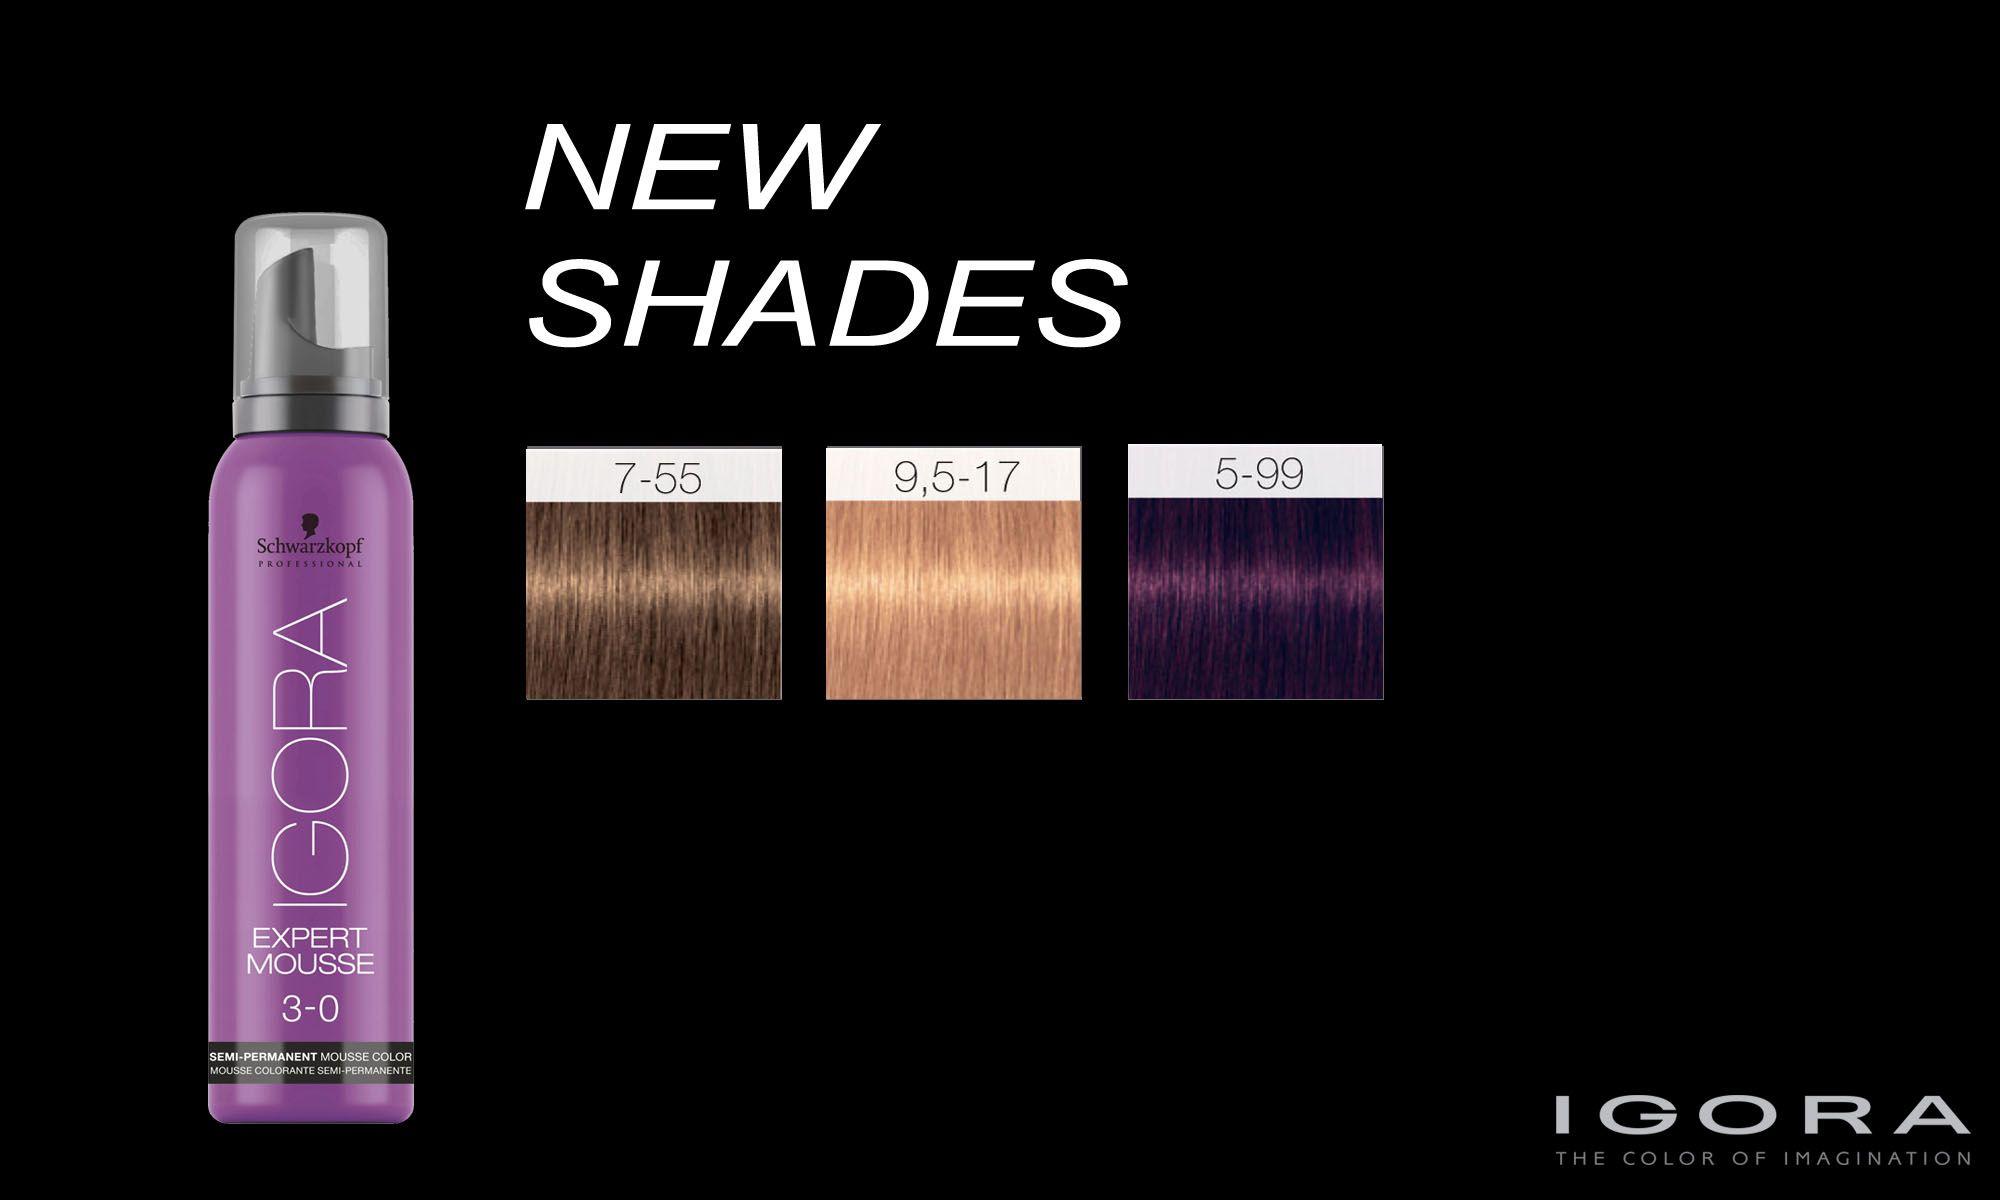 igora expert mousse color chart: Schwarzkopf professional igora expert mousse new shades